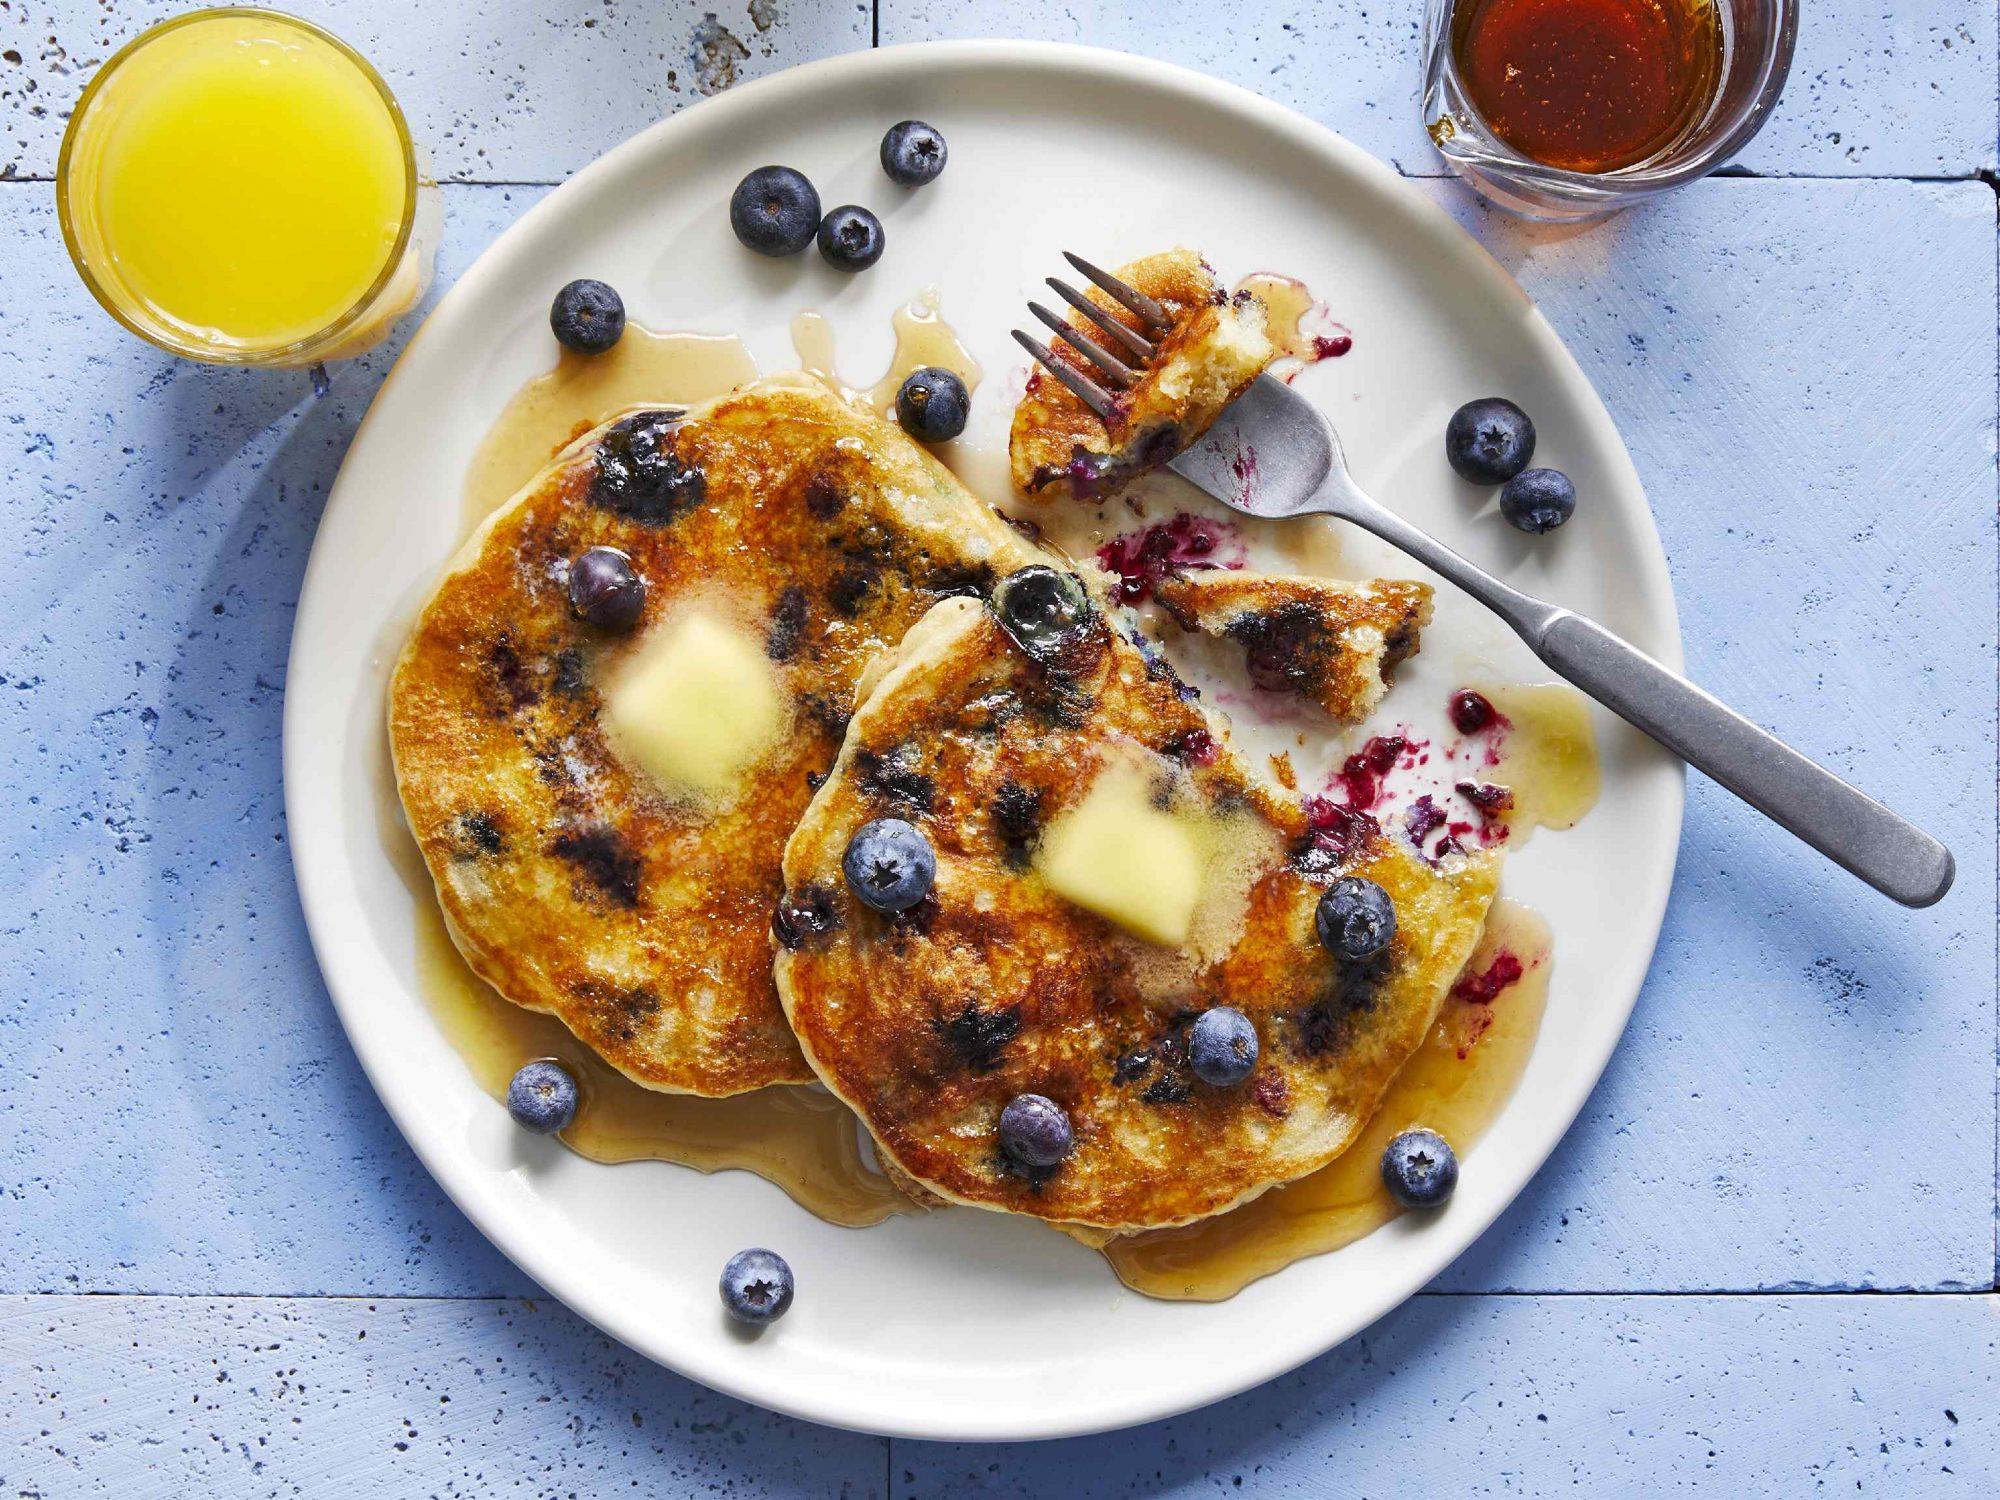 mr - Blueberry Pancakes Image